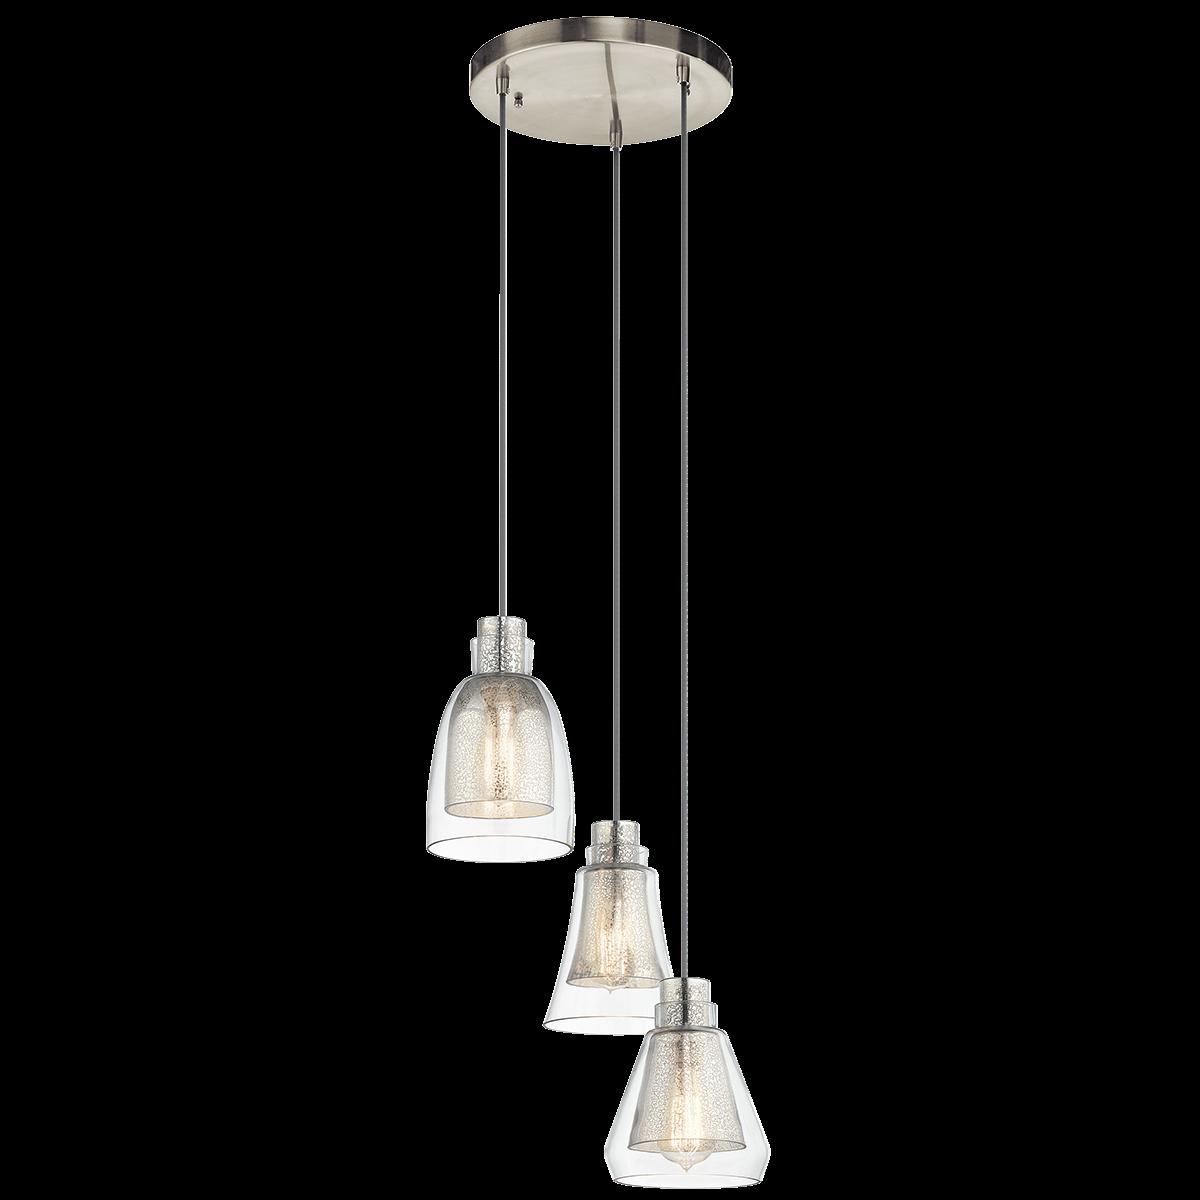 3 Light Pendant 43627ni In Brushed Nickel Evie Pendant Lighting Multi Light Pendant Ceiling Pendant Lights